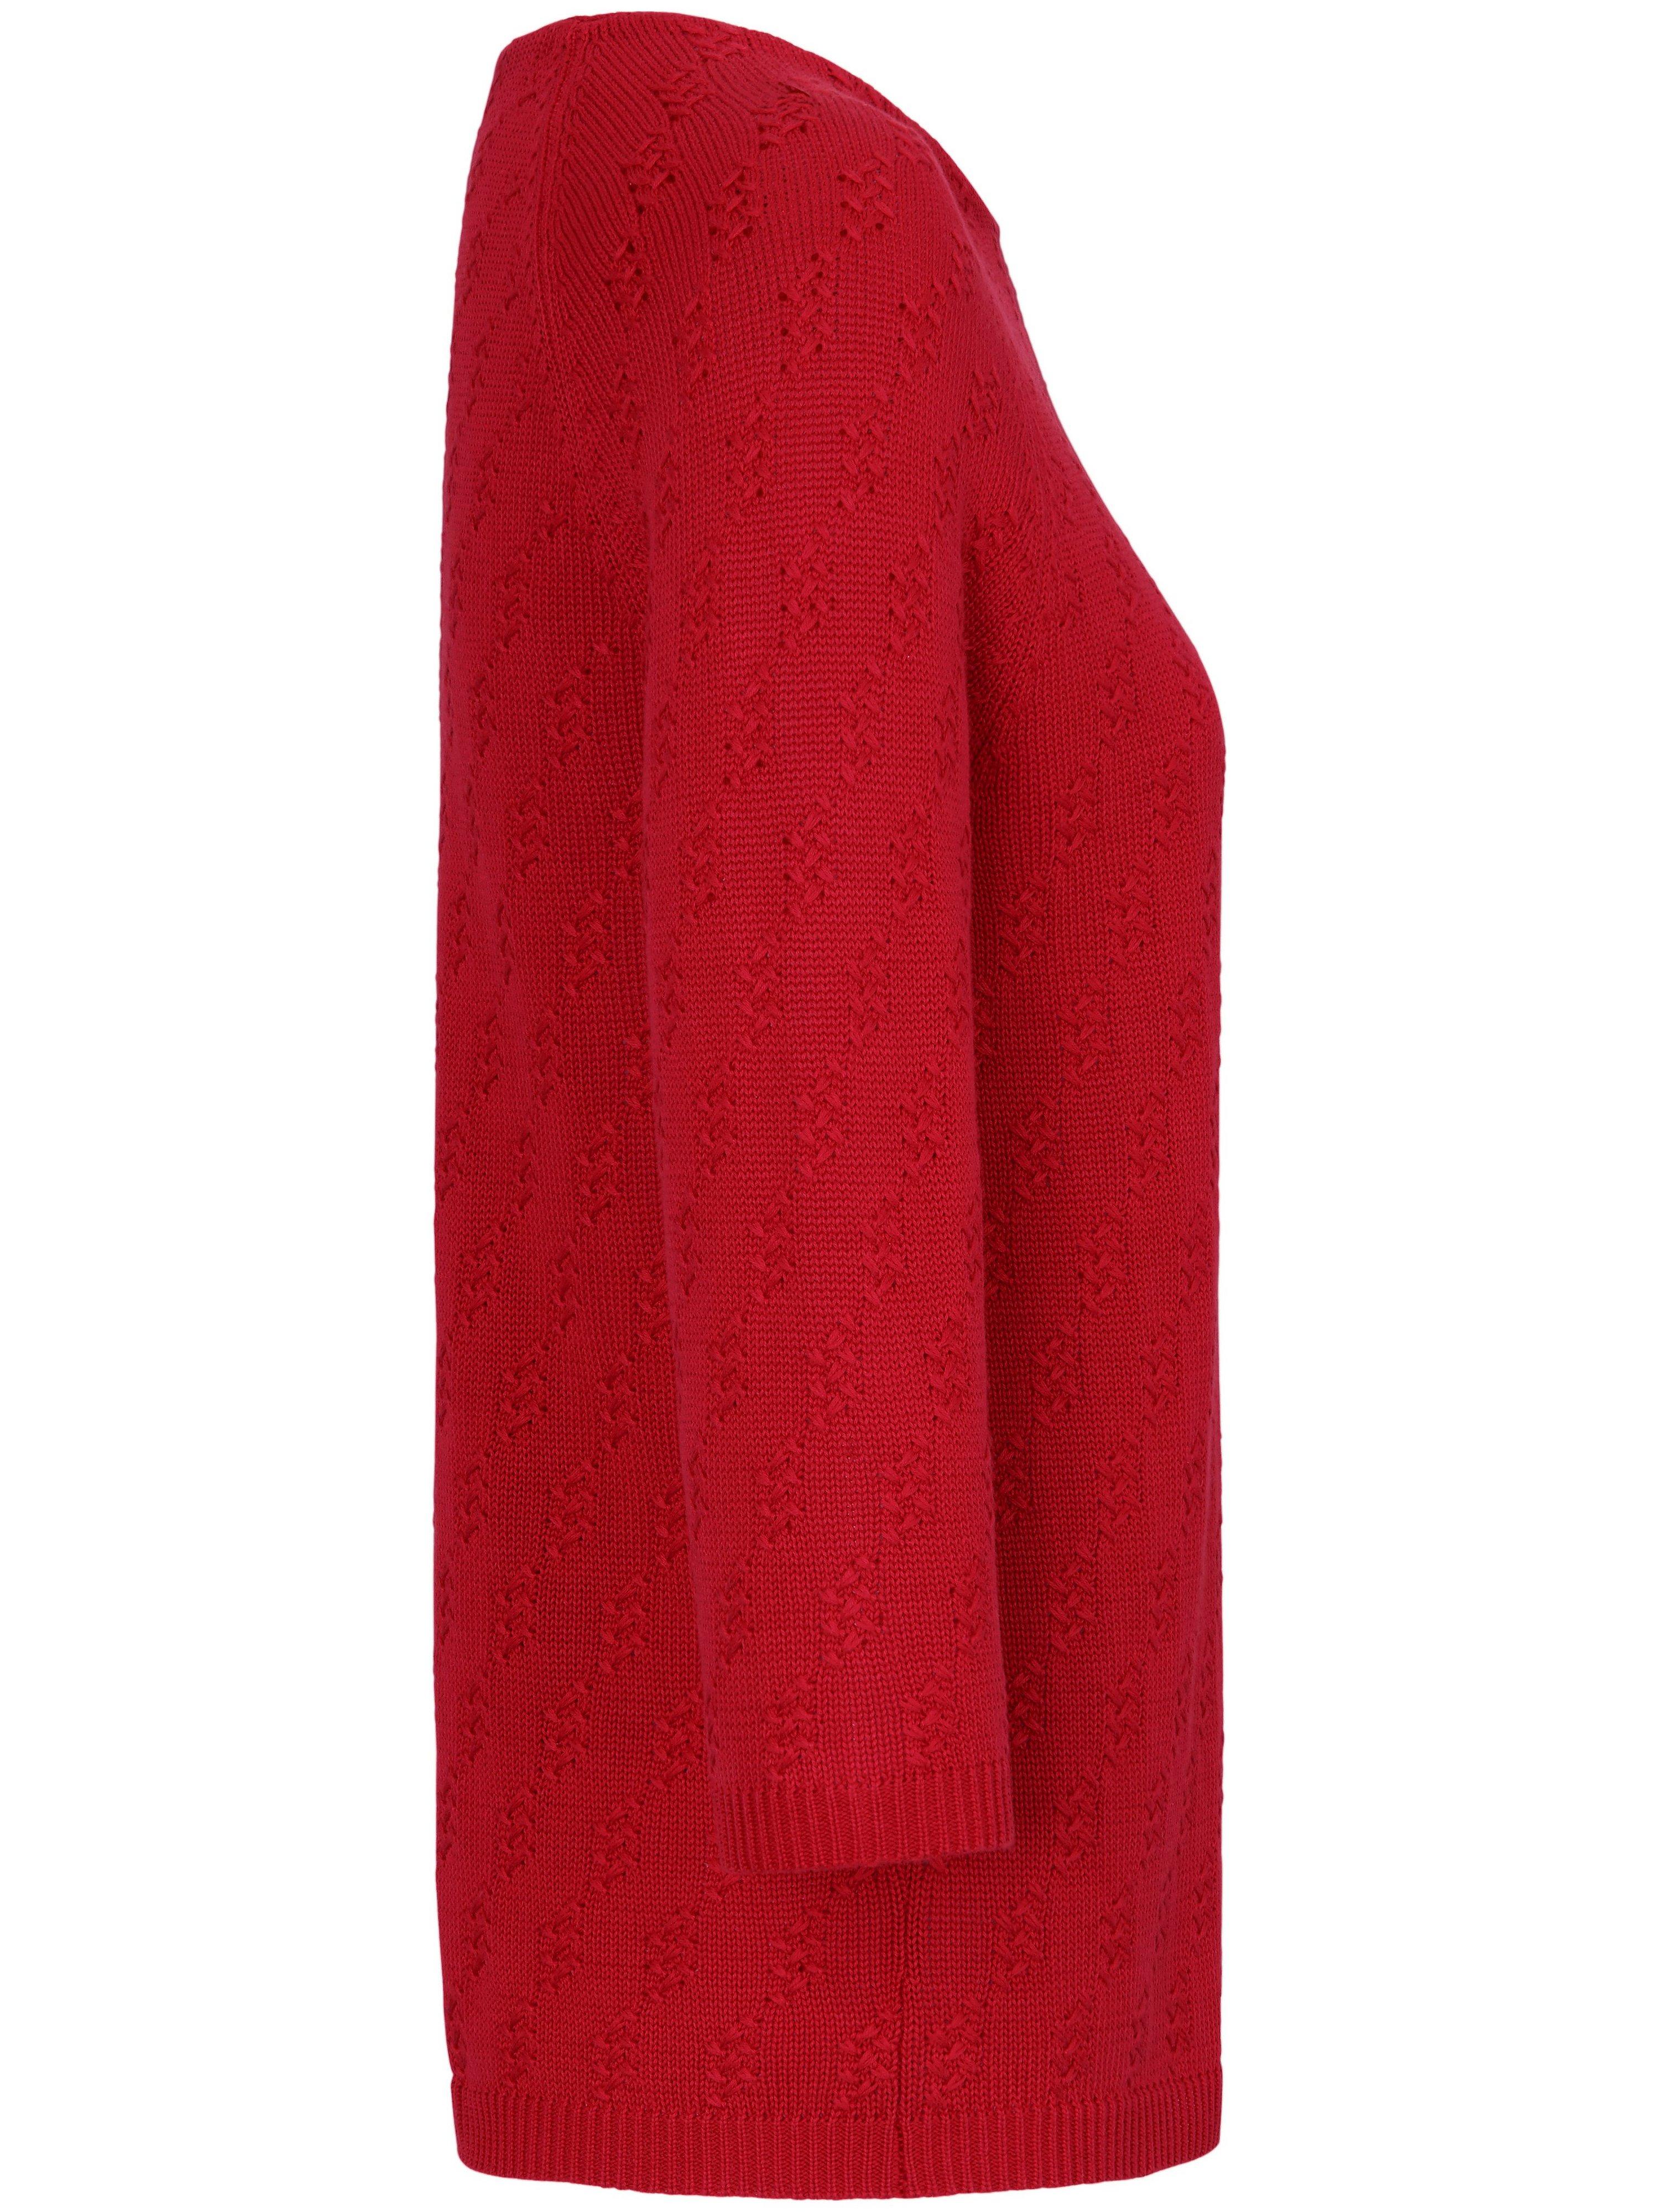 Strikbluse 3/4-lange raglanærmer Fra Peter Hahn rød